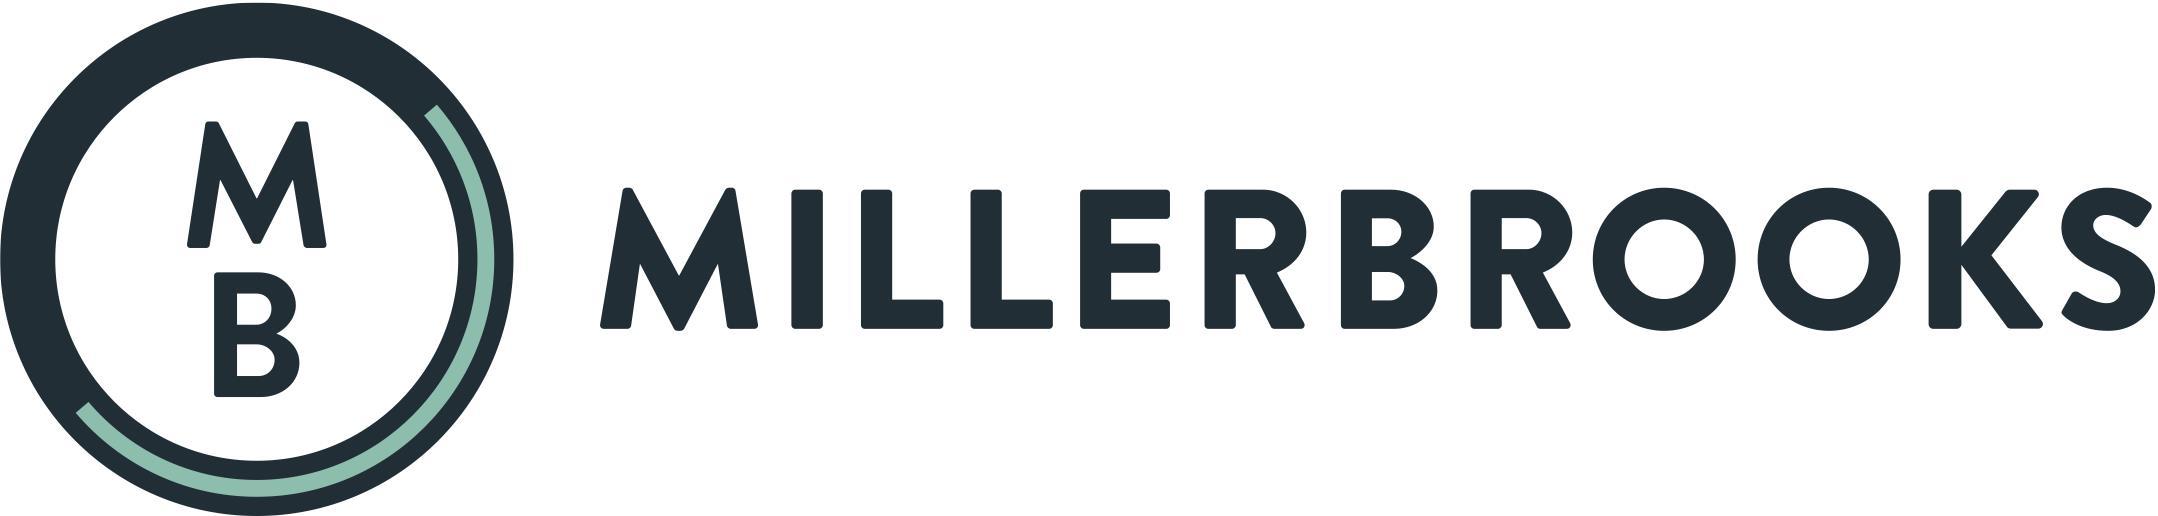 Miller Brooks